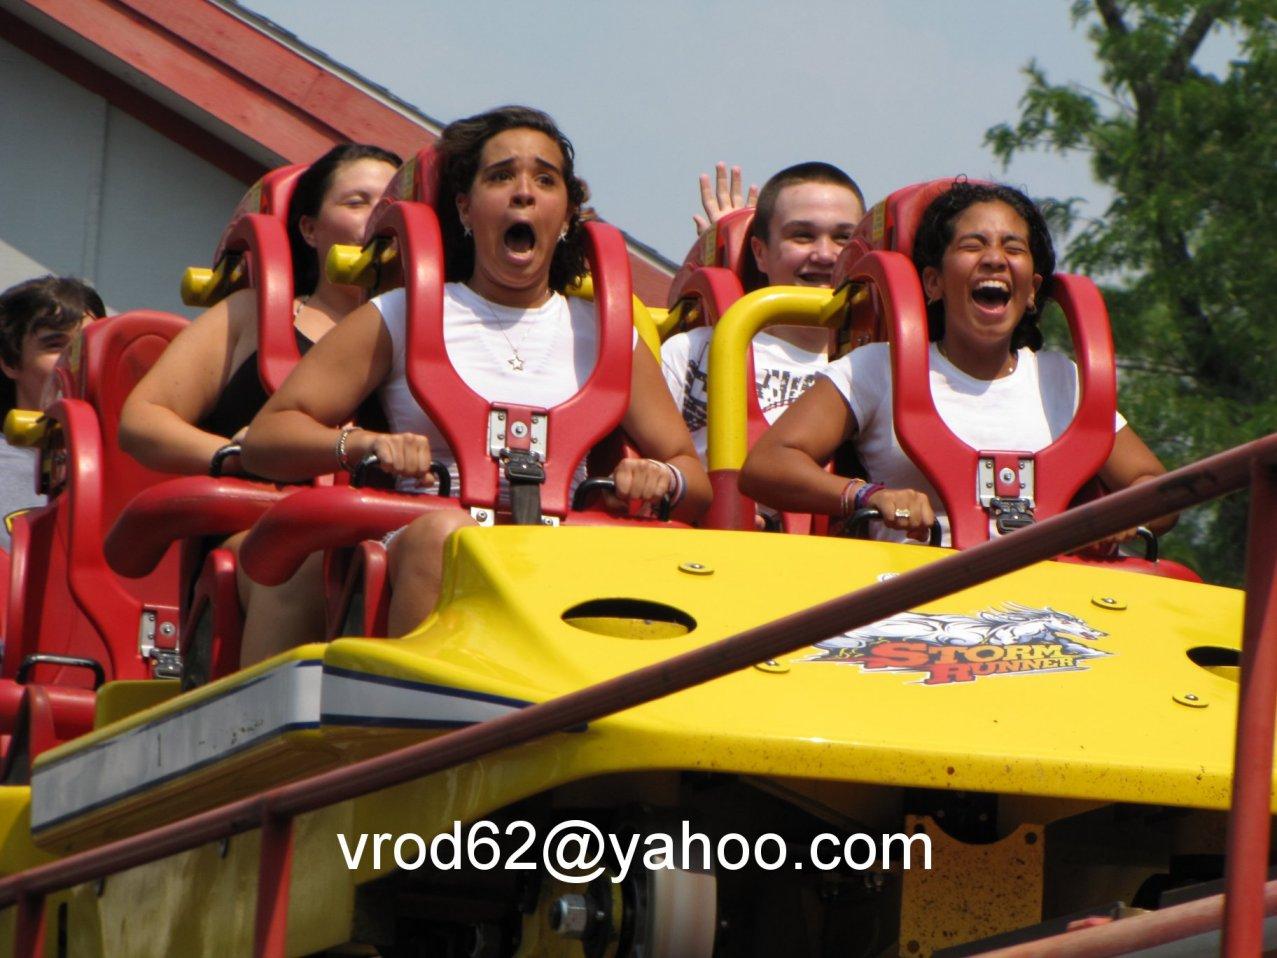 Essay On Fear Of Rollercoasters